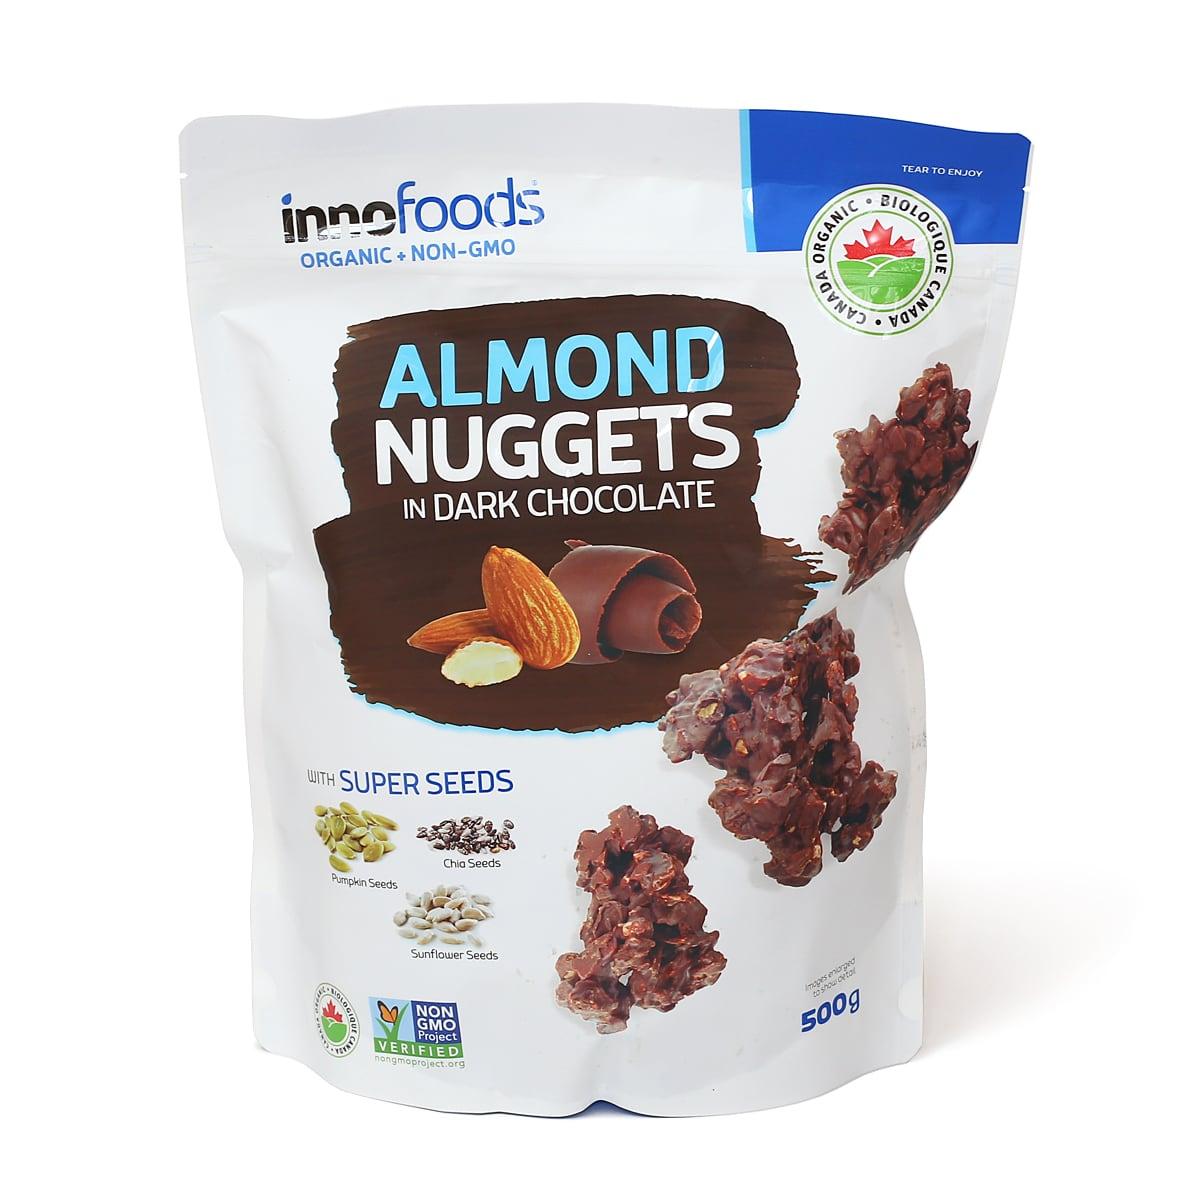 innofoods オーガニックアーモンドナゲッツ IN ダークチョコレート